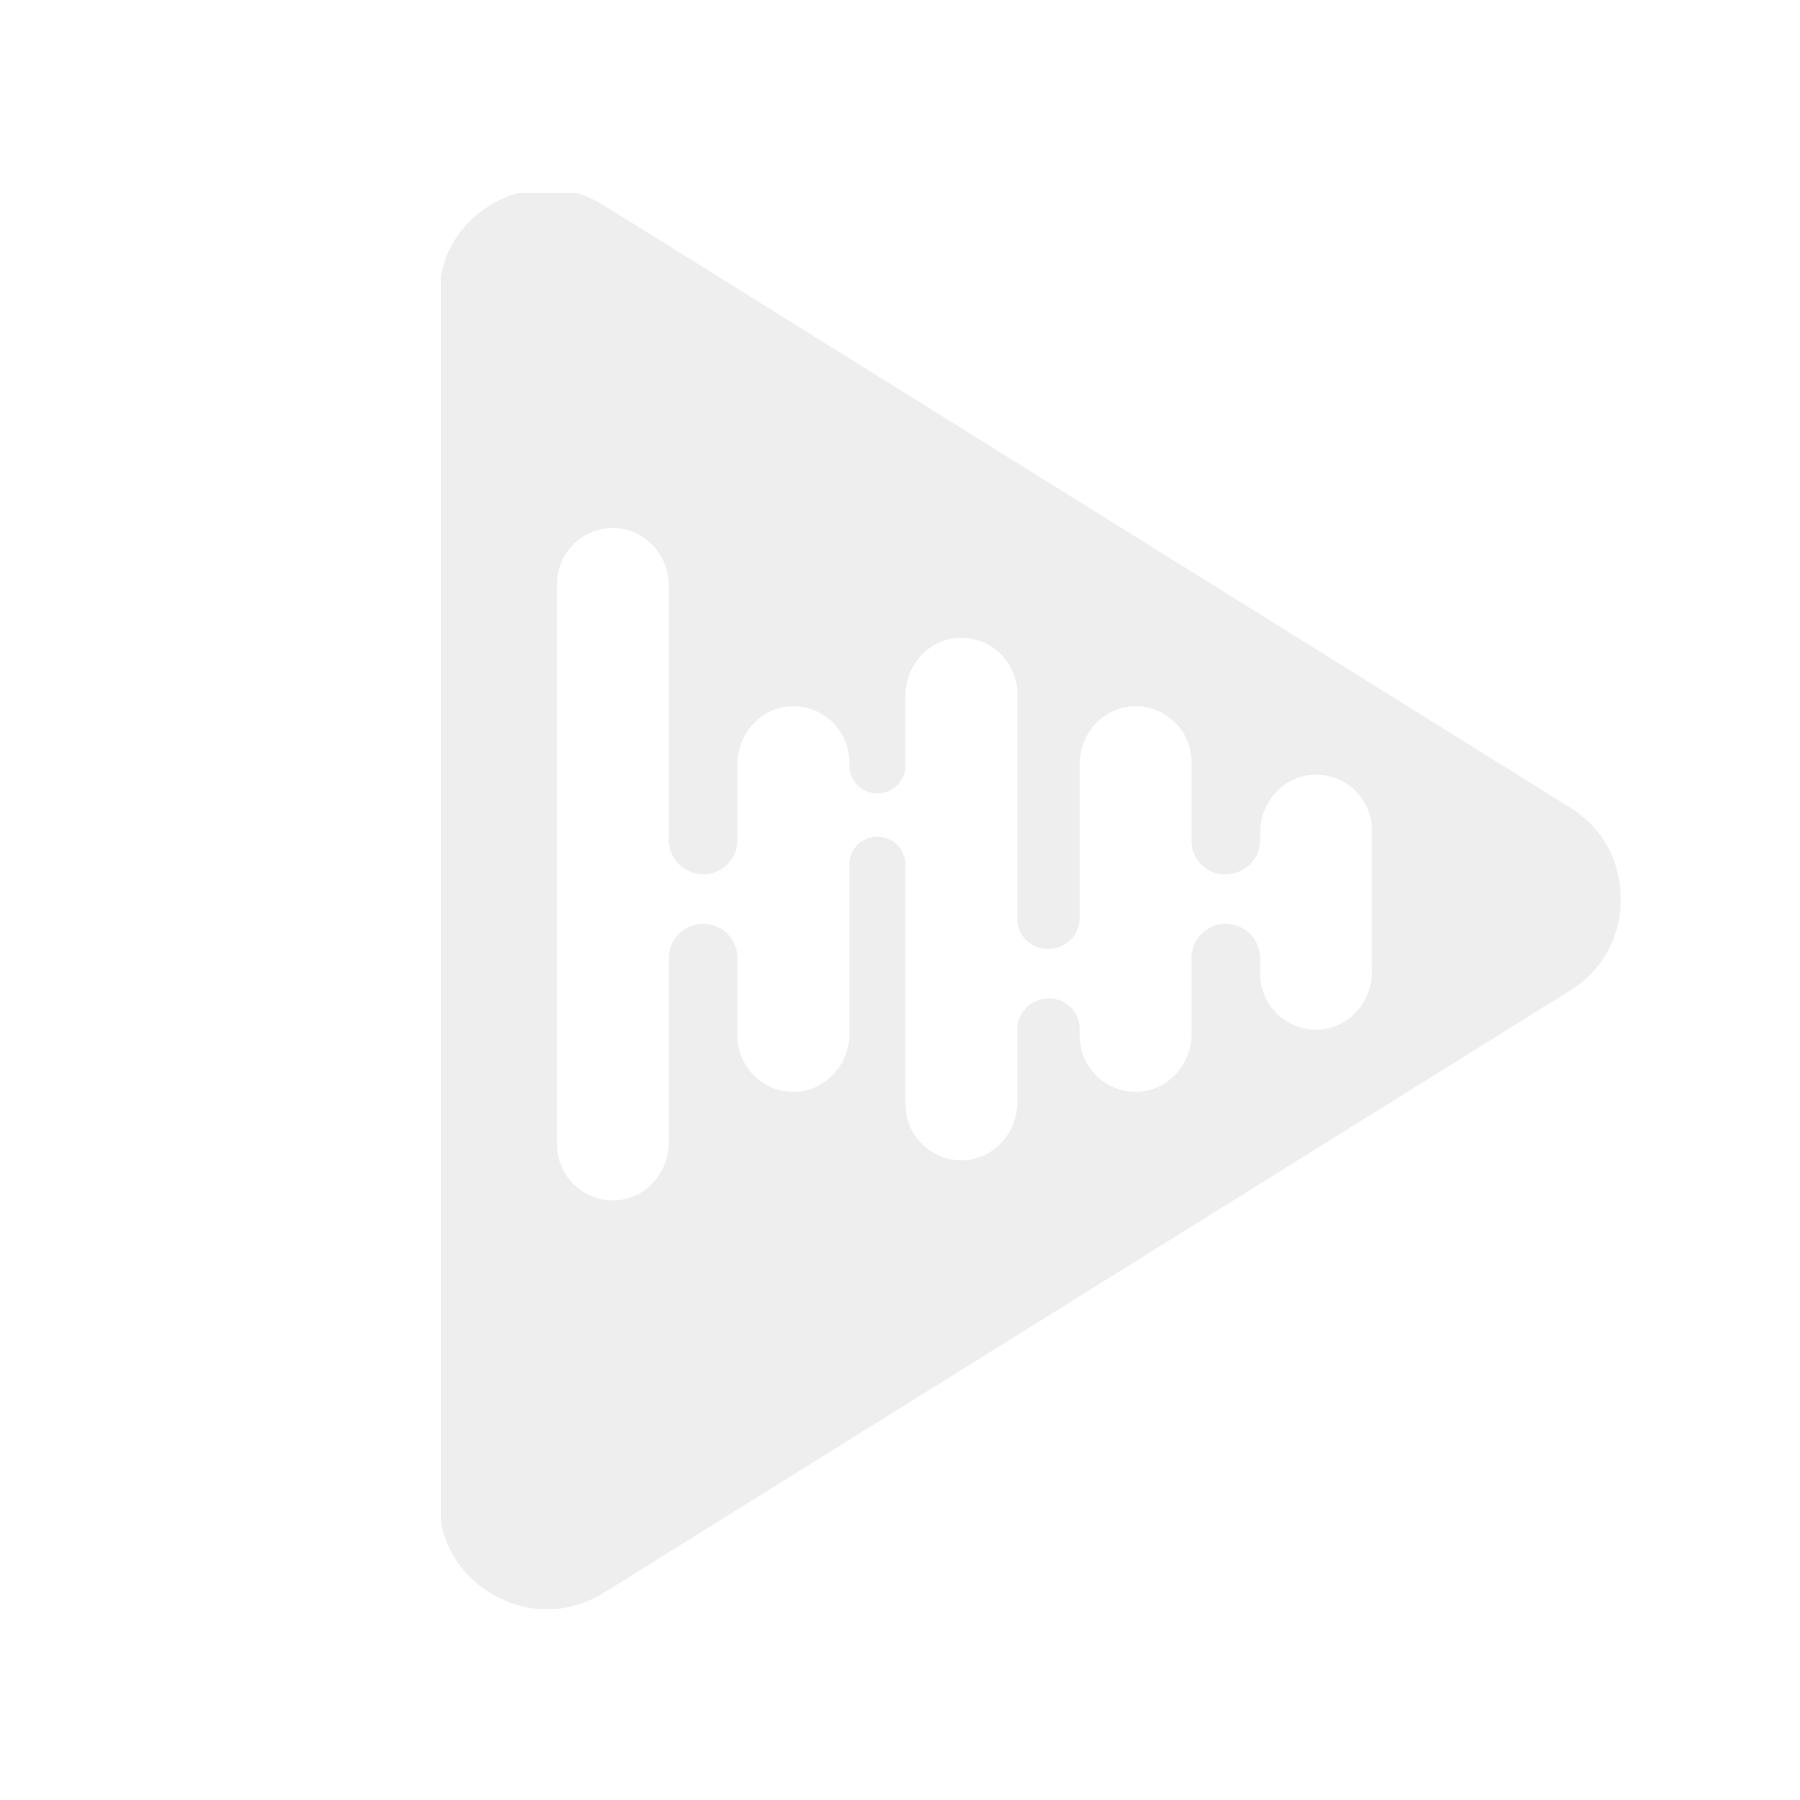 Audison APBMW-E81-E87-BASE